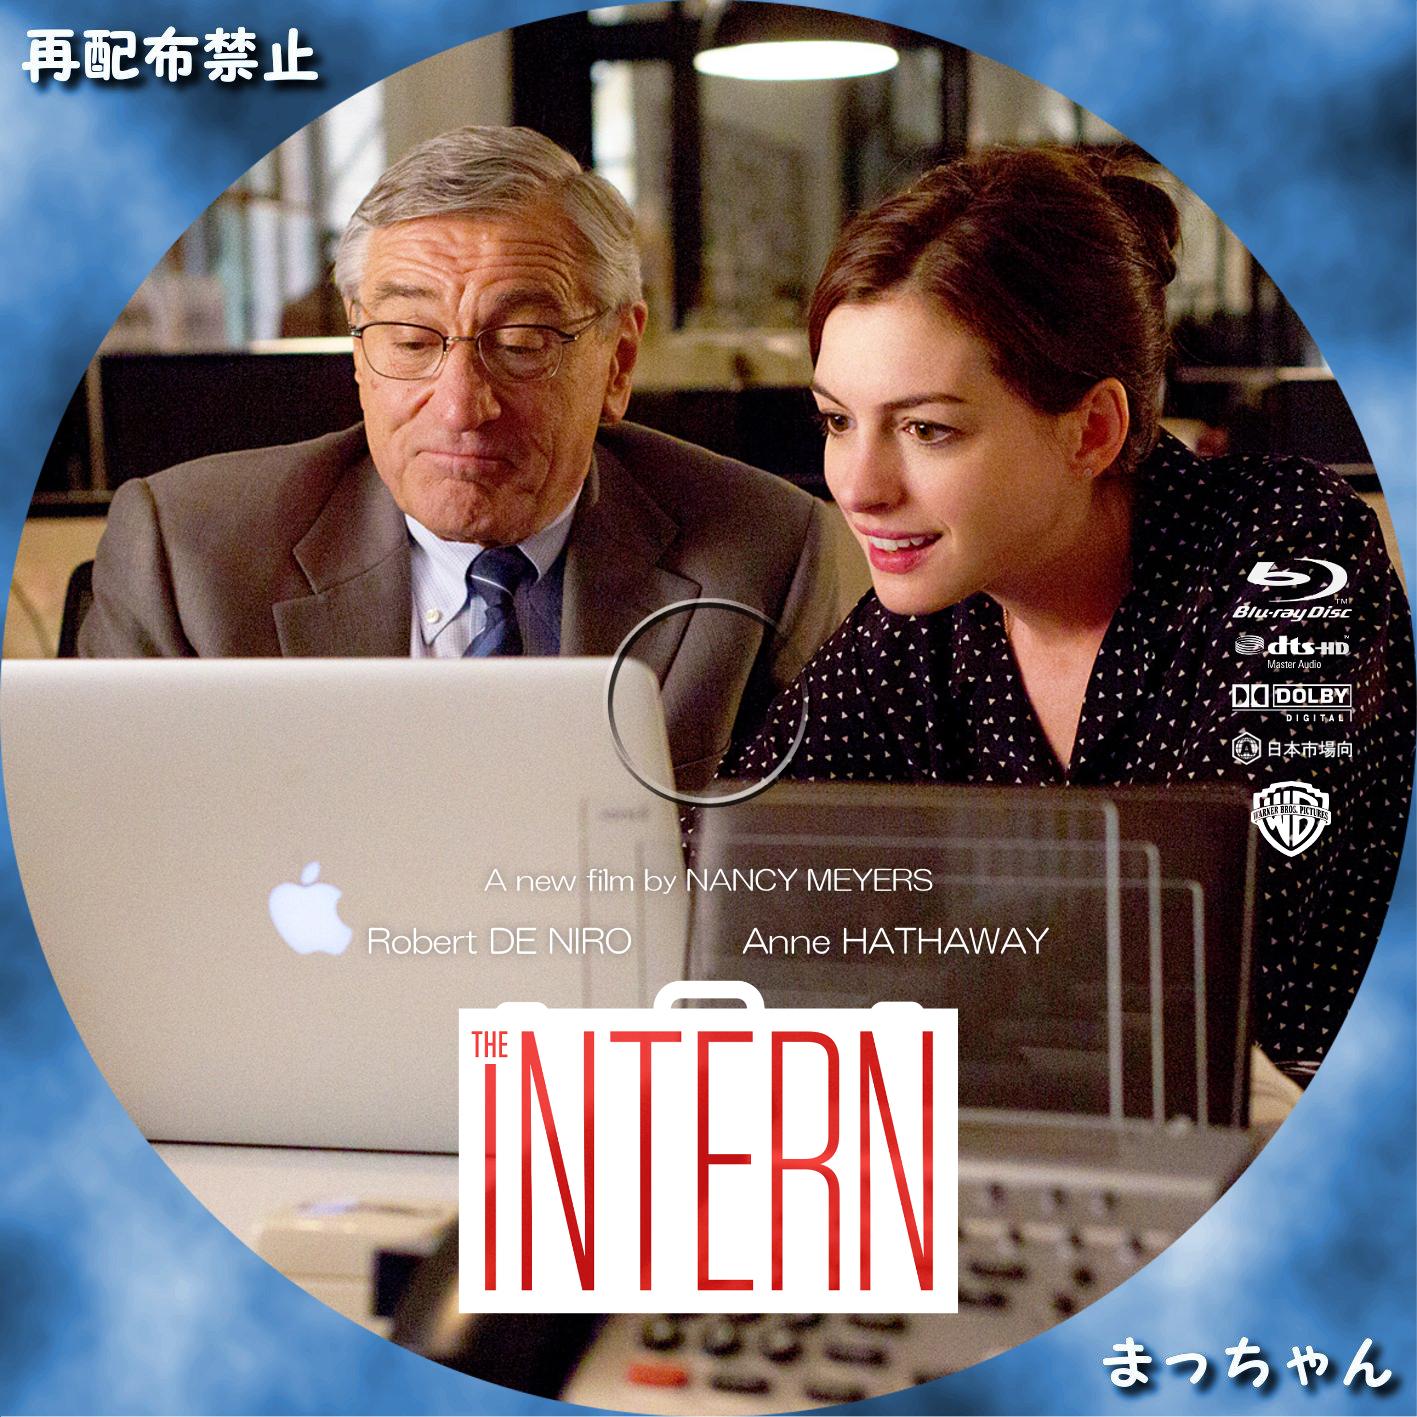 The Intern DVD Label